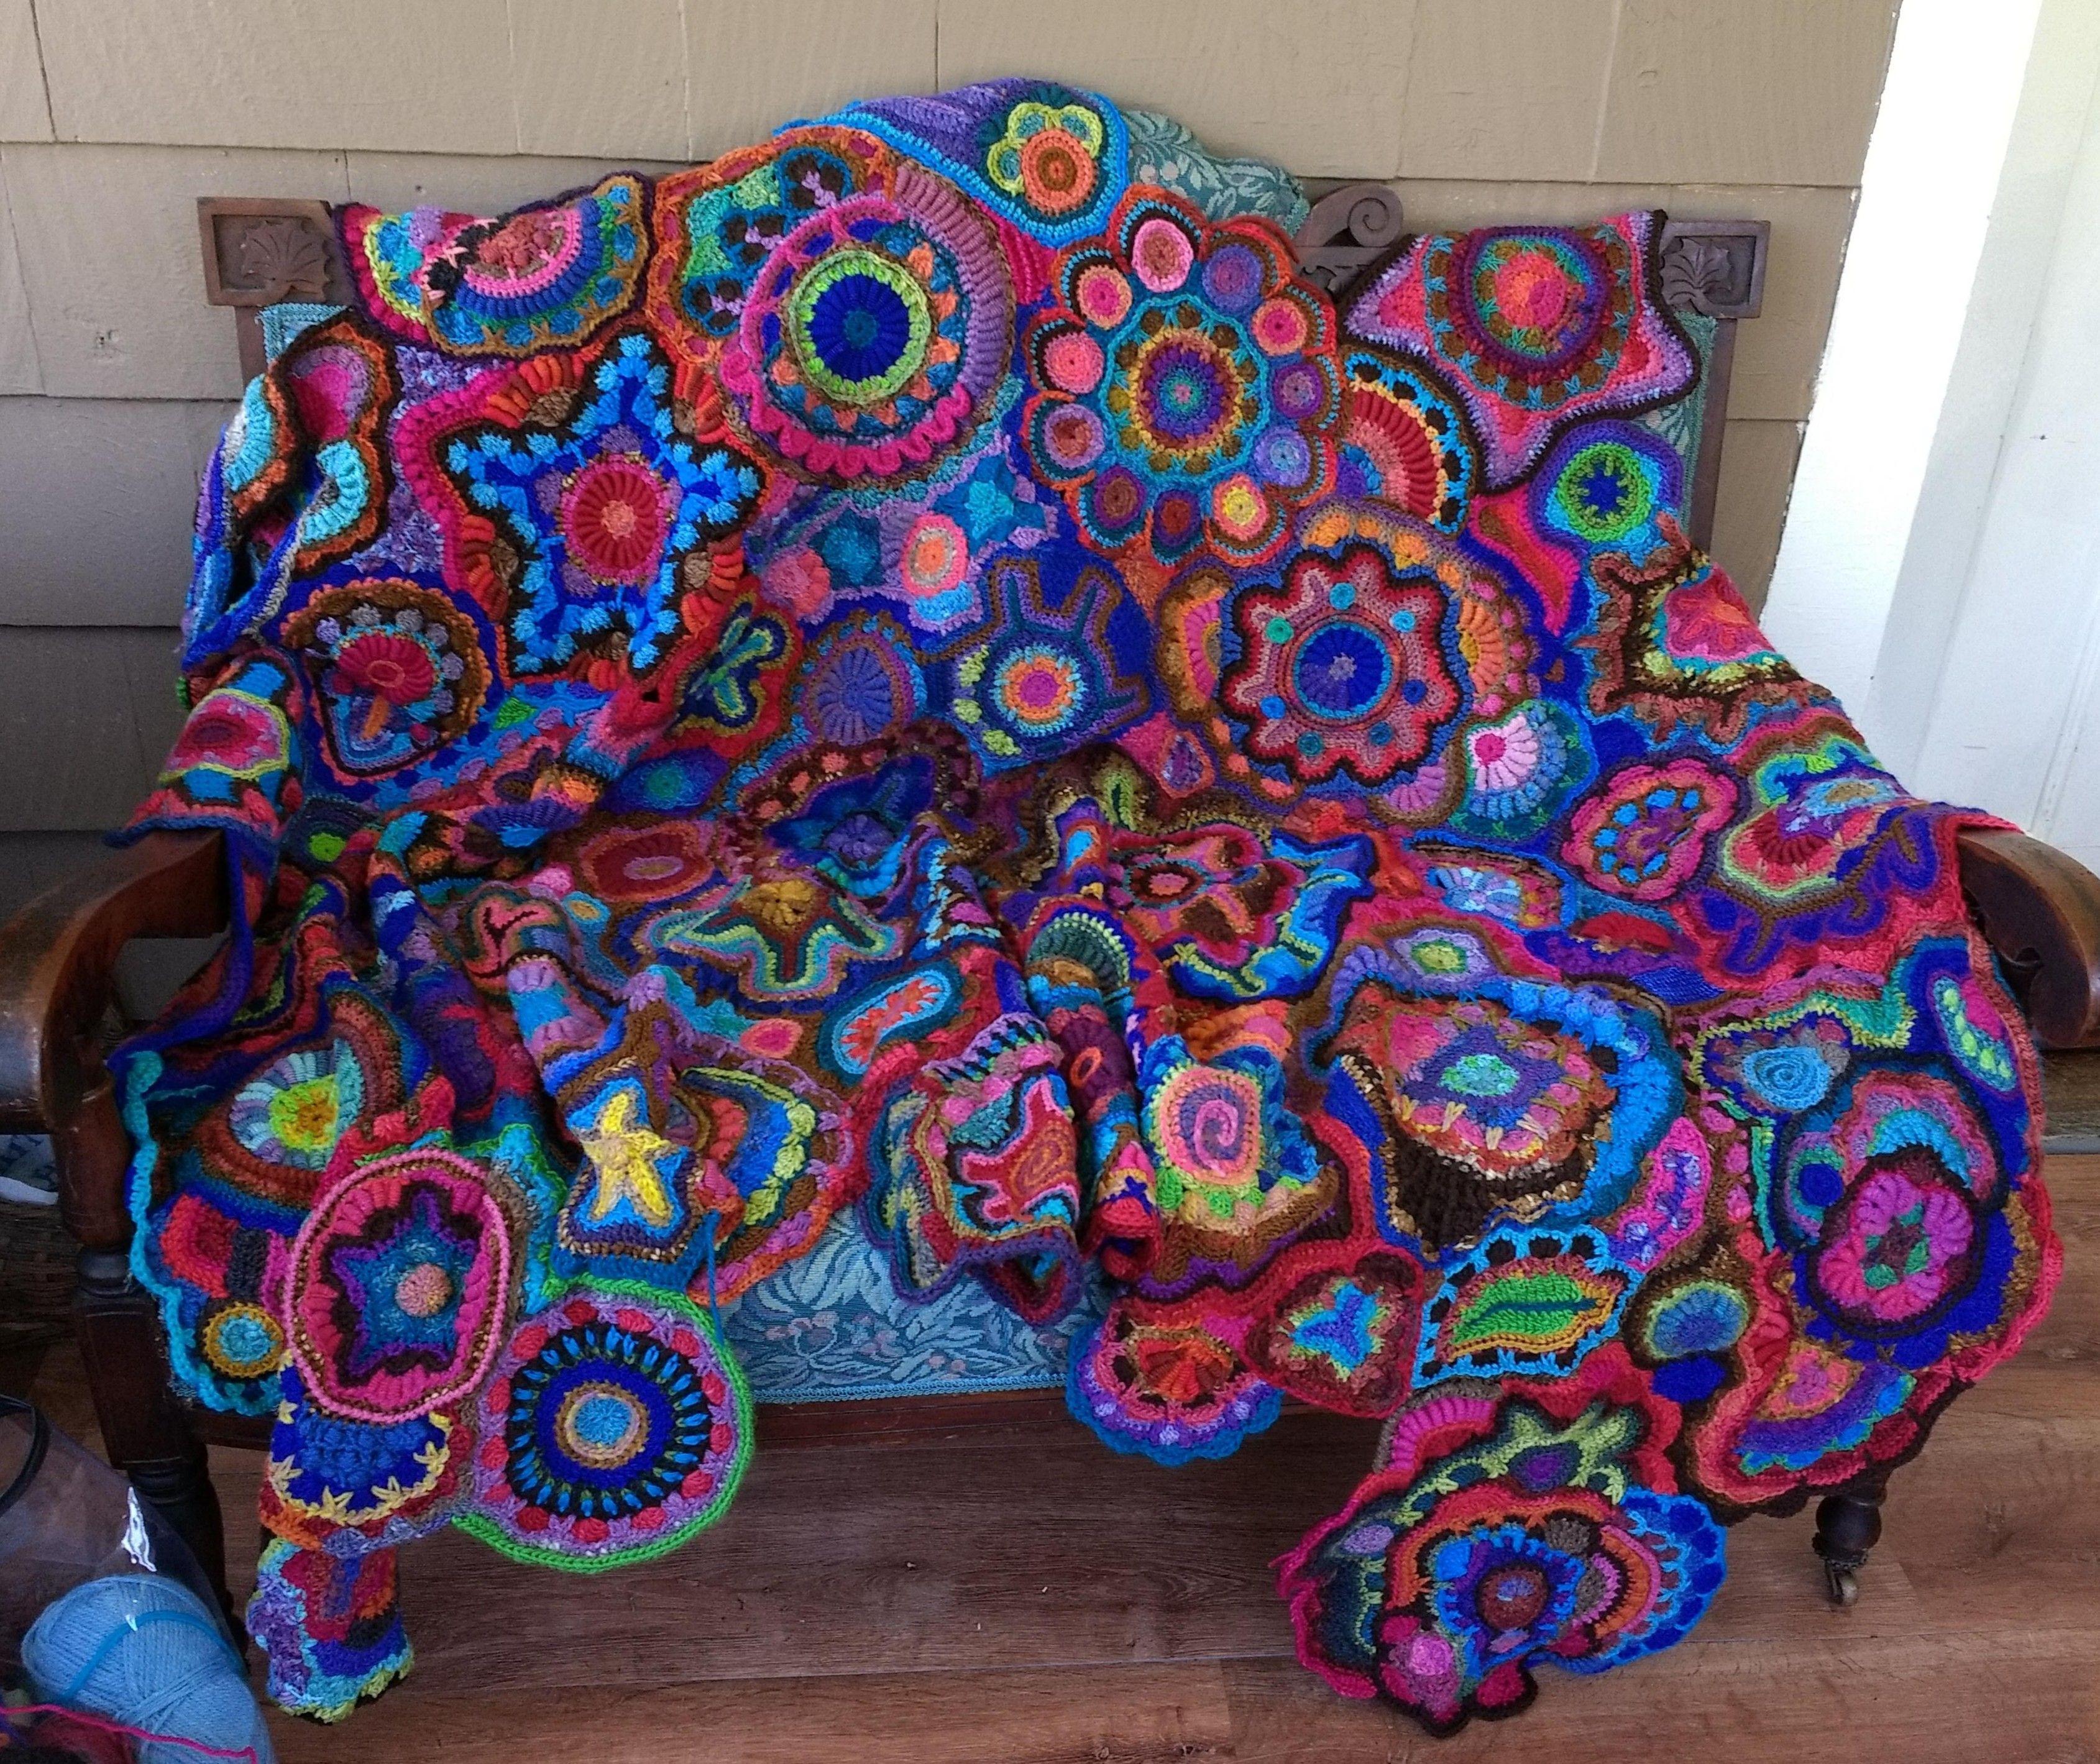 My Freeform Crochet Psychedelic Security Blanket Crochet Home Crochet Blanket Crochet Blanket Patterns